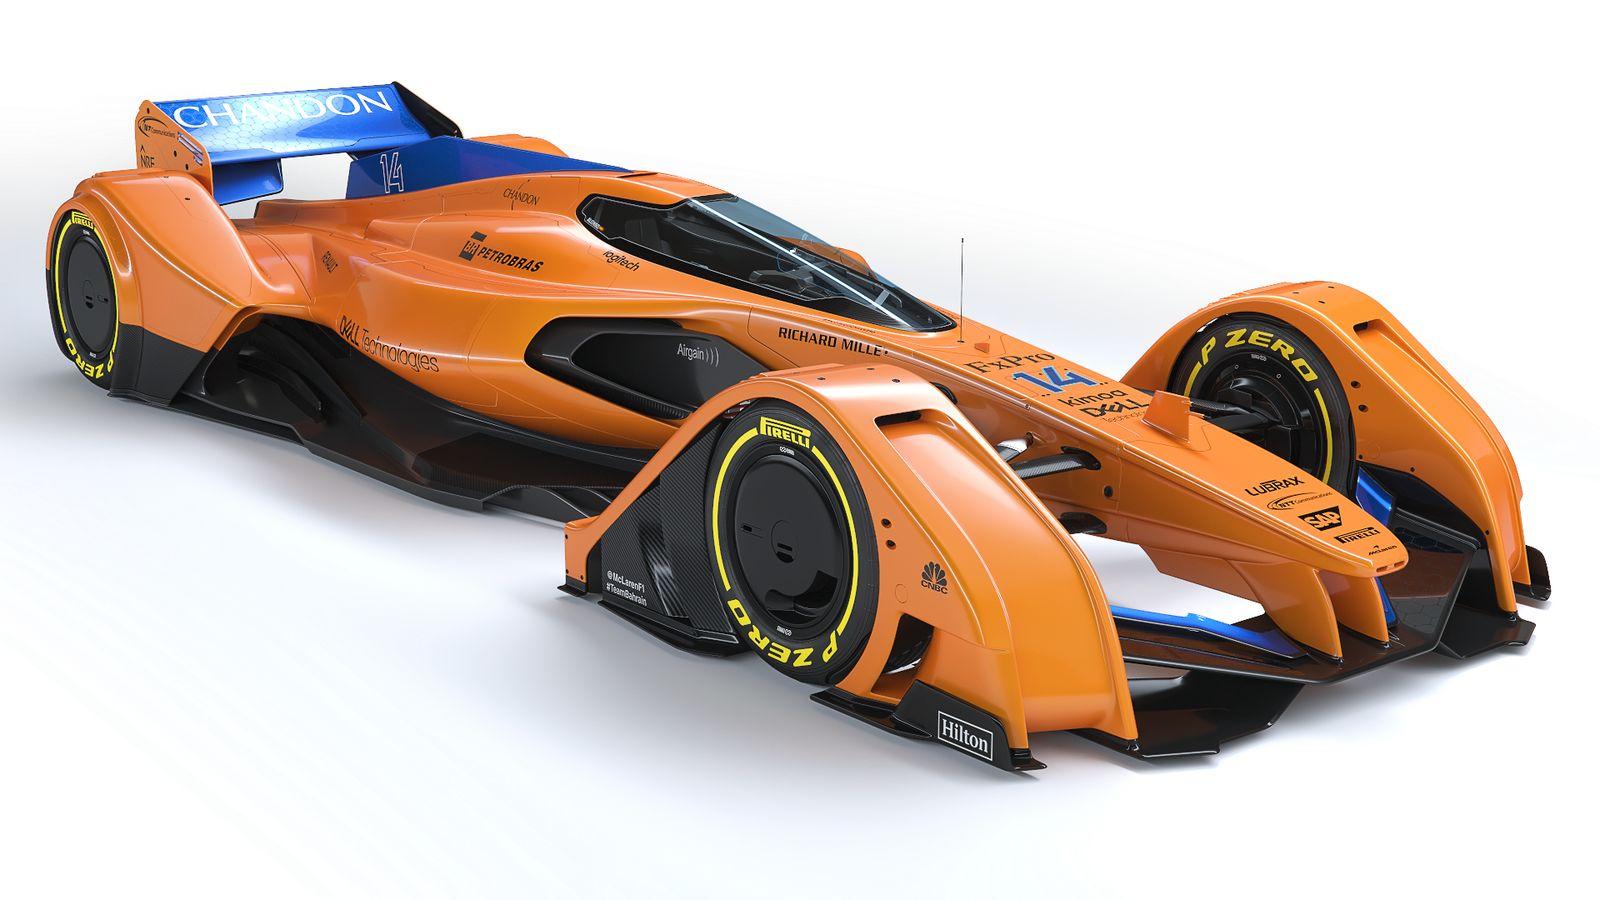 mclaren x2 2018 concept f1 car racing news. Black Bedroom Furniture Sets. Home Design Ideas